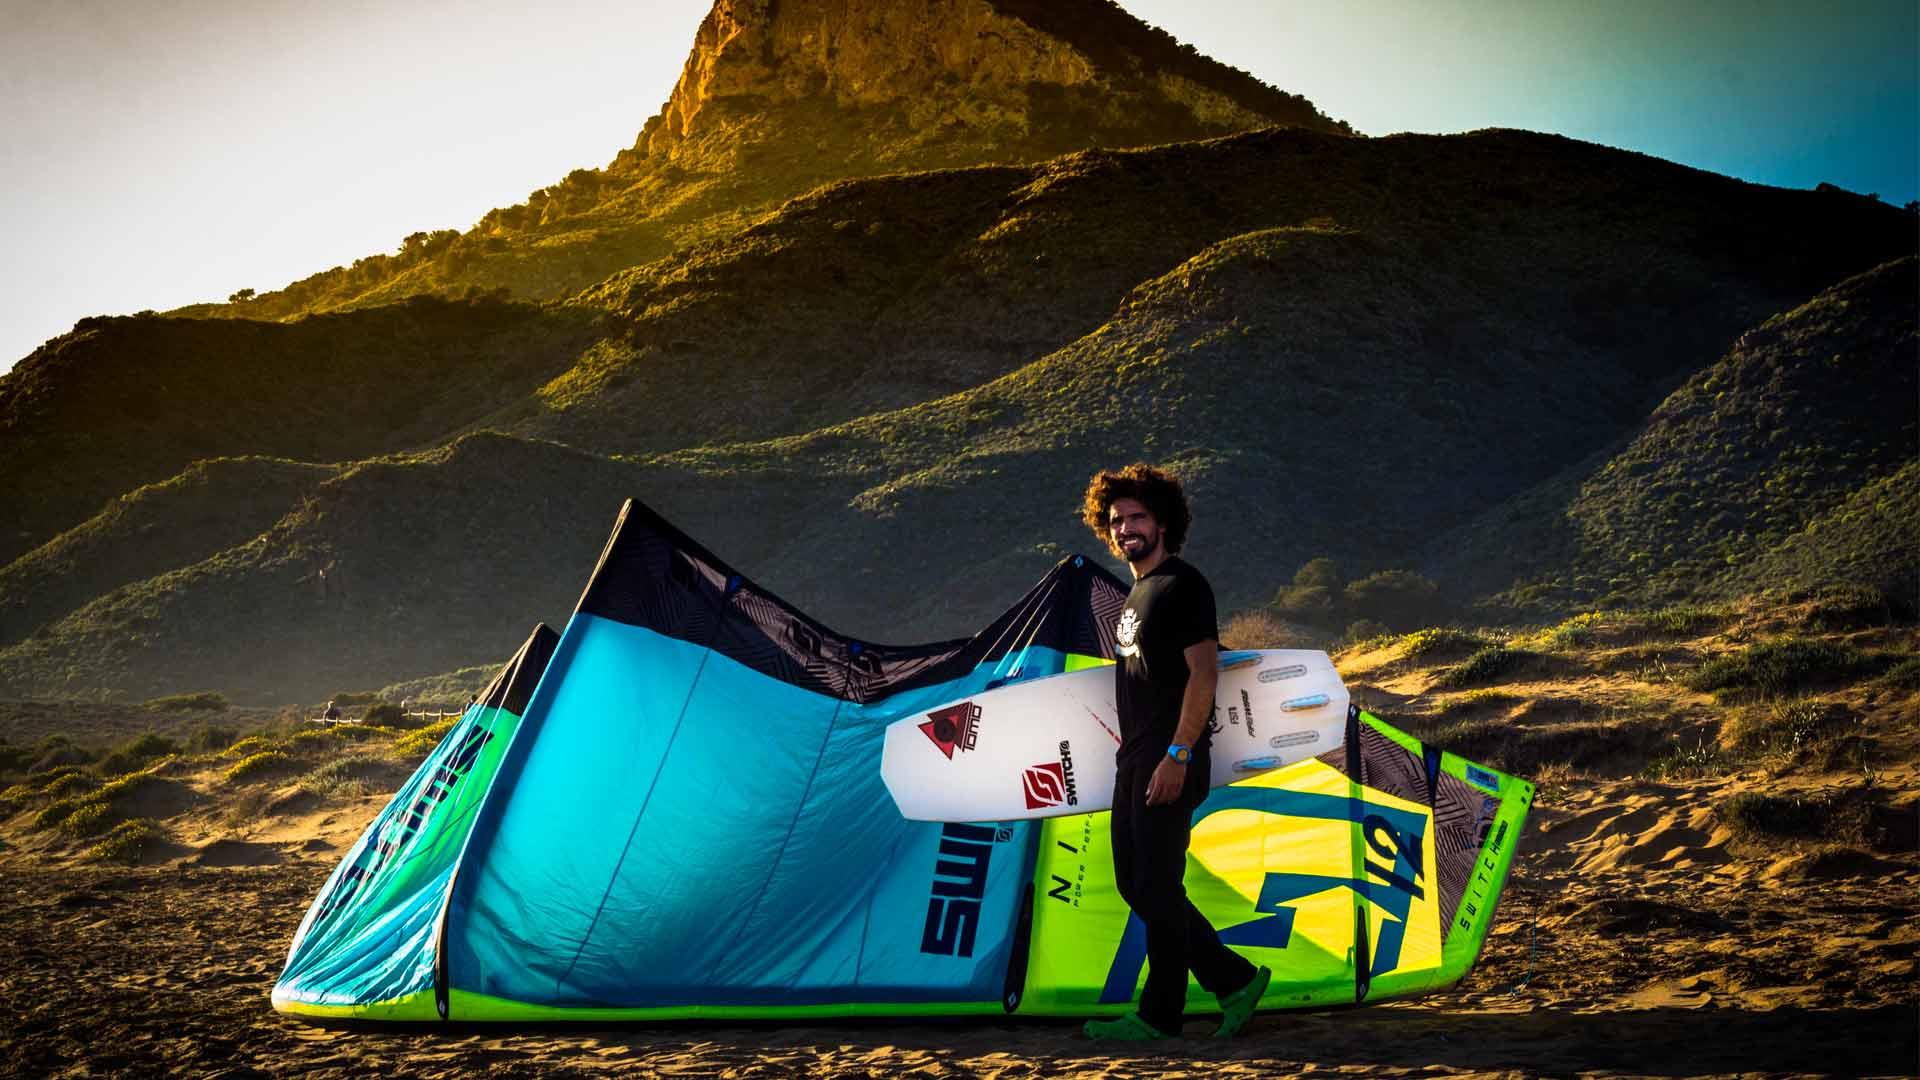 Gernavarro.com kitesurf calblanque switchkites firewire surfboards LOW